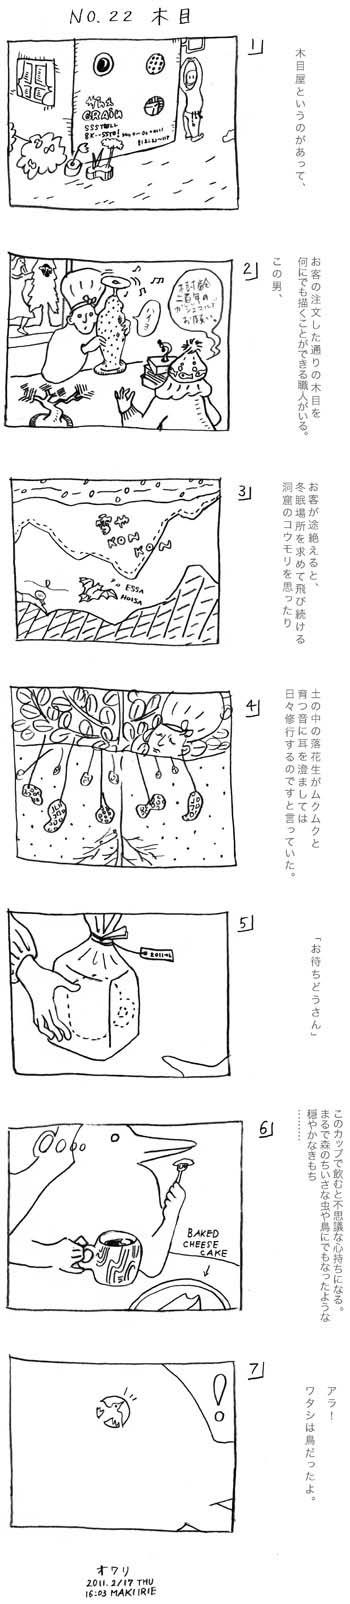 110217mokume.jpg